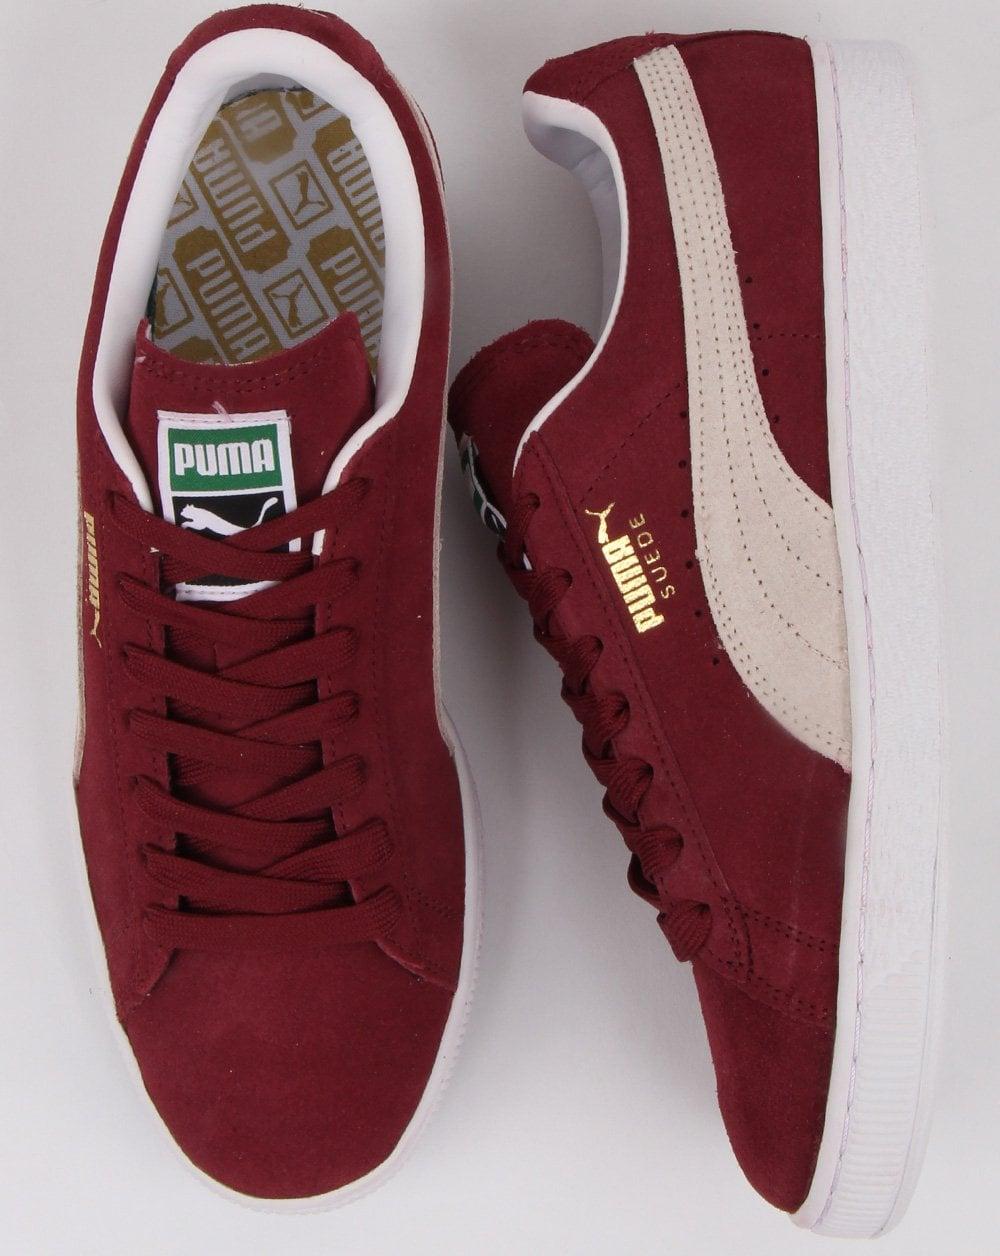 Puma Suede Classic Trainers Burgundy